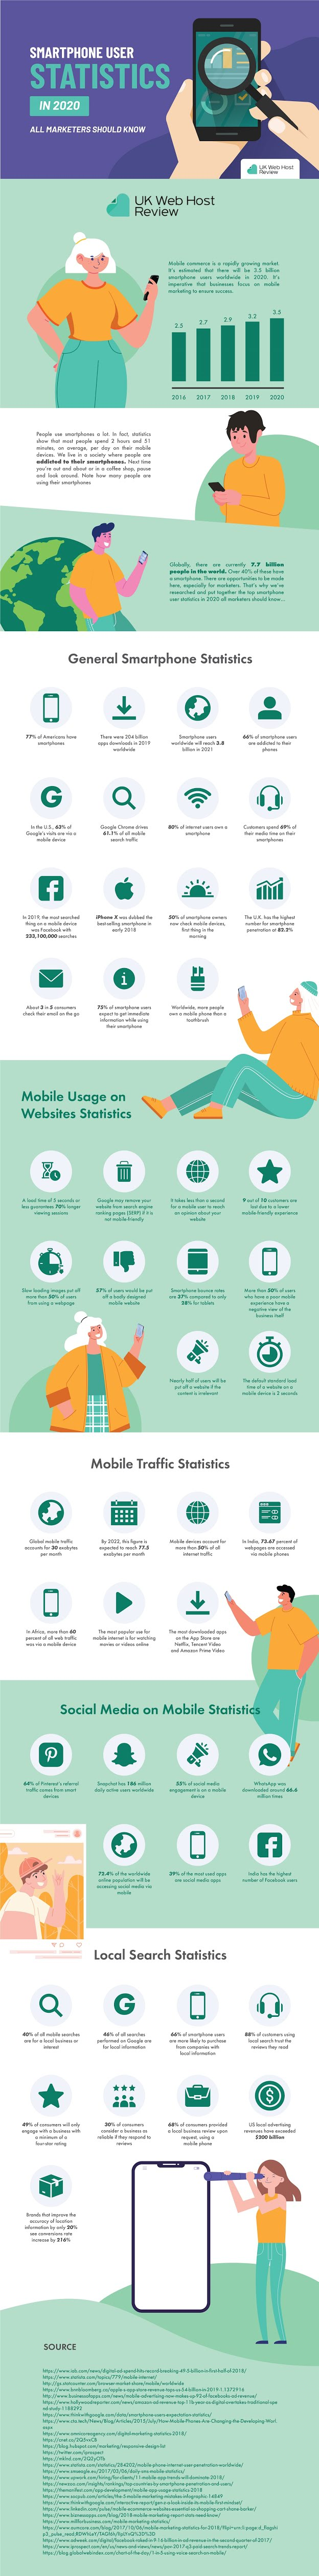 Smartphone User Statistics in 2020 #infographic